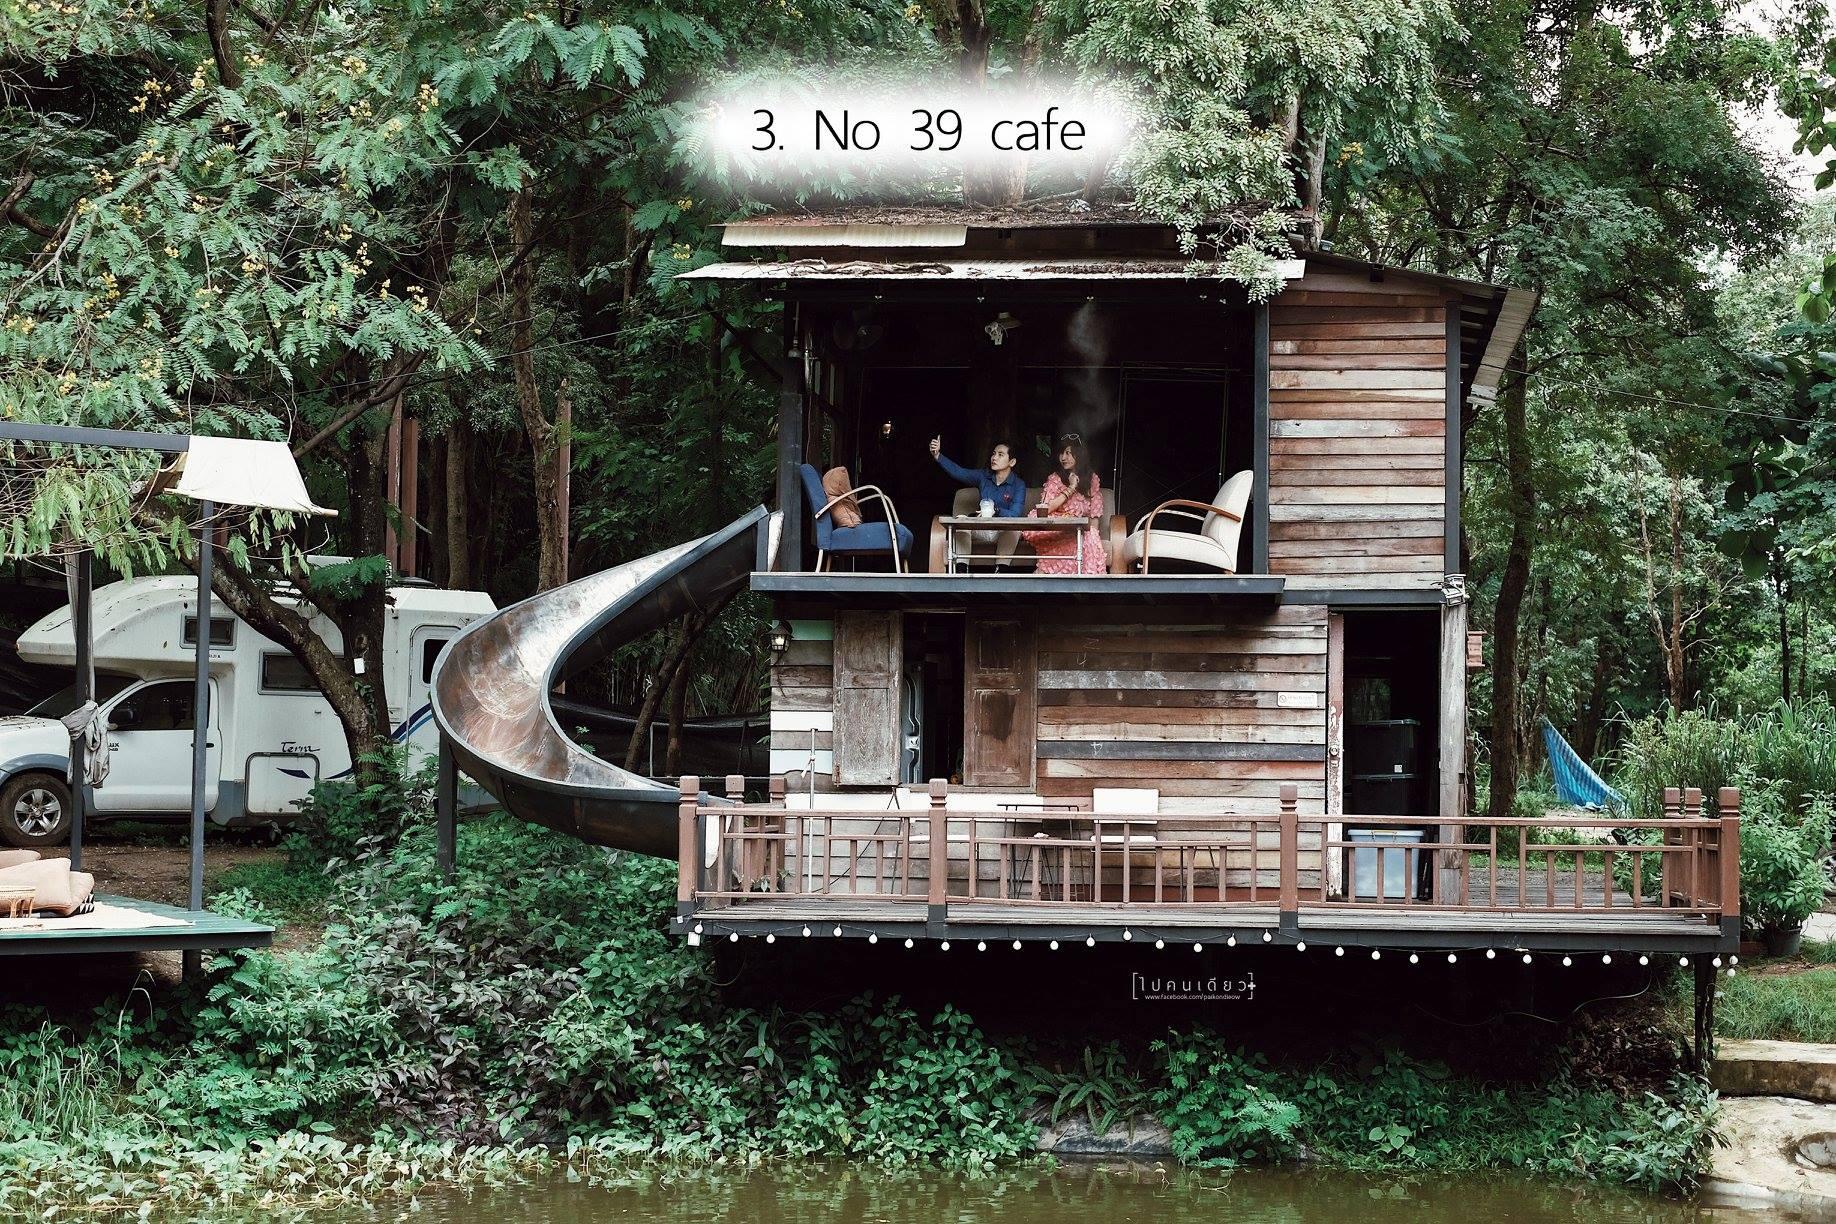 CafeChiangmai, Cafe, Coffee, Chiangmai, Drivemateasia, Drivemate, ร้านน่านั่ง, คาเฟ่, เชียงใหม่, คาเฟ่เชียงใหม่, รถเช่า, เช่ารถเที่ยว, เช่ารถ, รถเช่าเชียงใหม่, รวมคาเฟ่เชียงใหม่, เชียงใหม่เที่ยวไหนดี